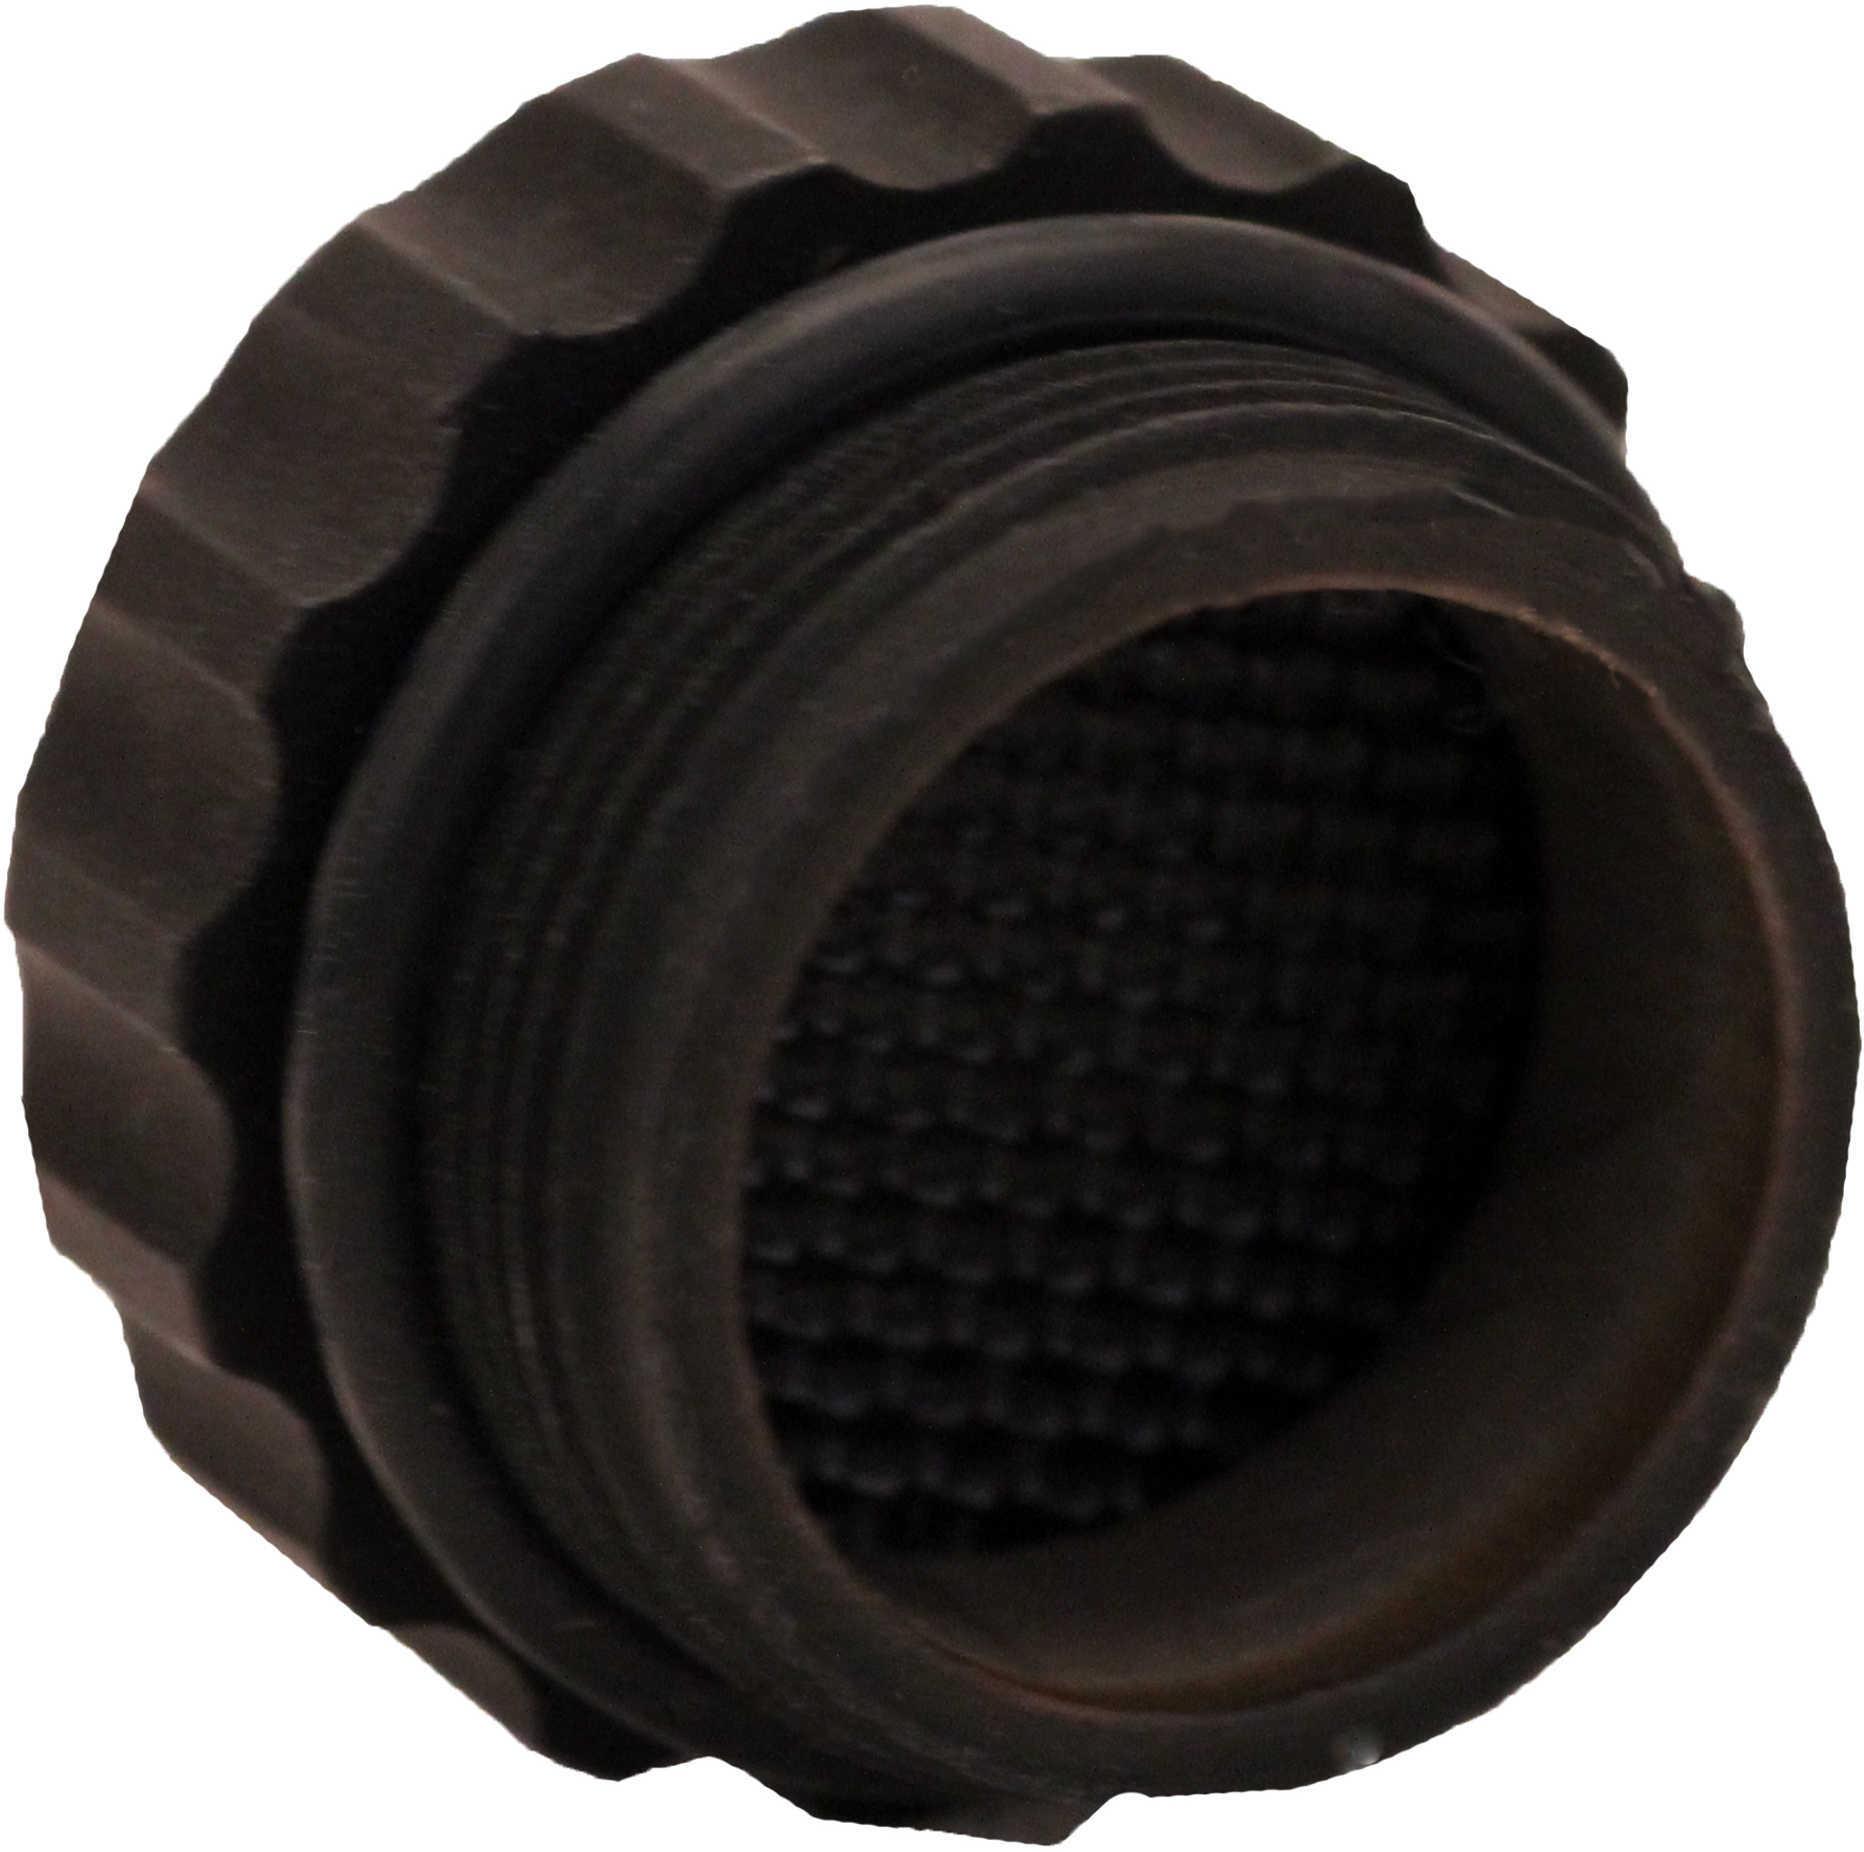 Aimpoint Battery Cap CompM2/Ml2, M3/Ml3 Md: 10631